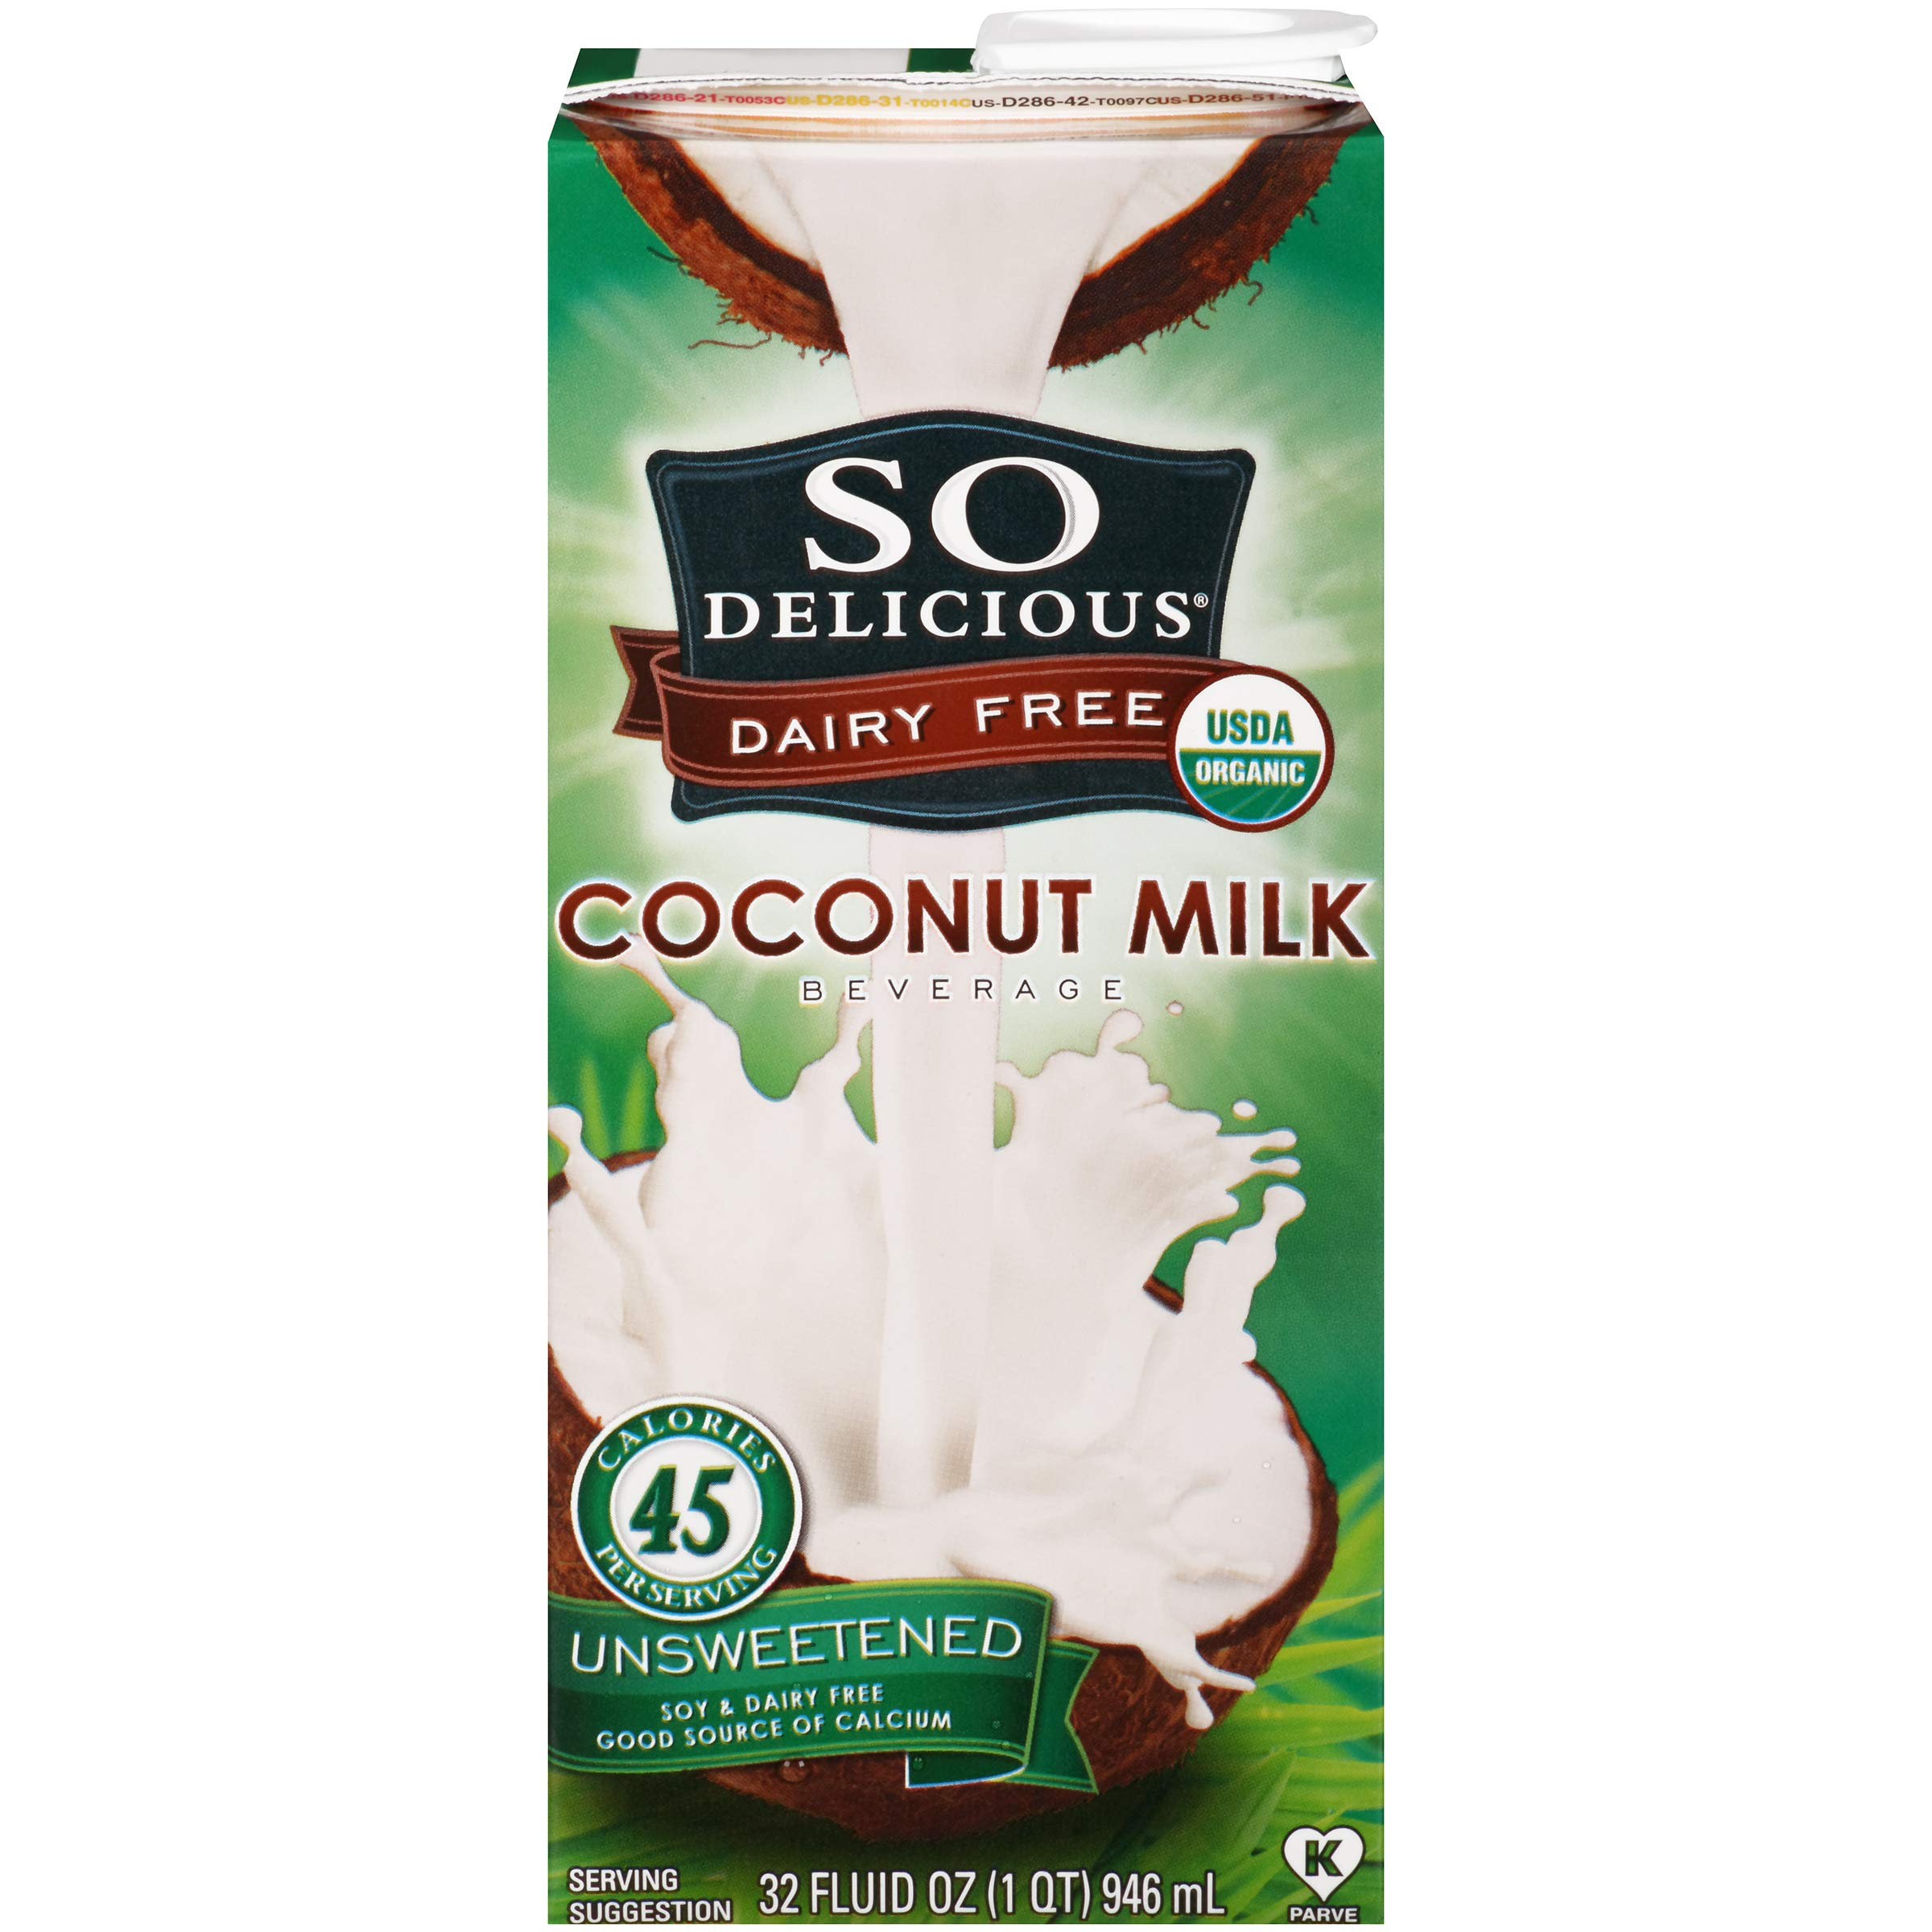 So Delicious Dairy Free Coconutmilk Beverage, Unsweetened, 32 fl oz